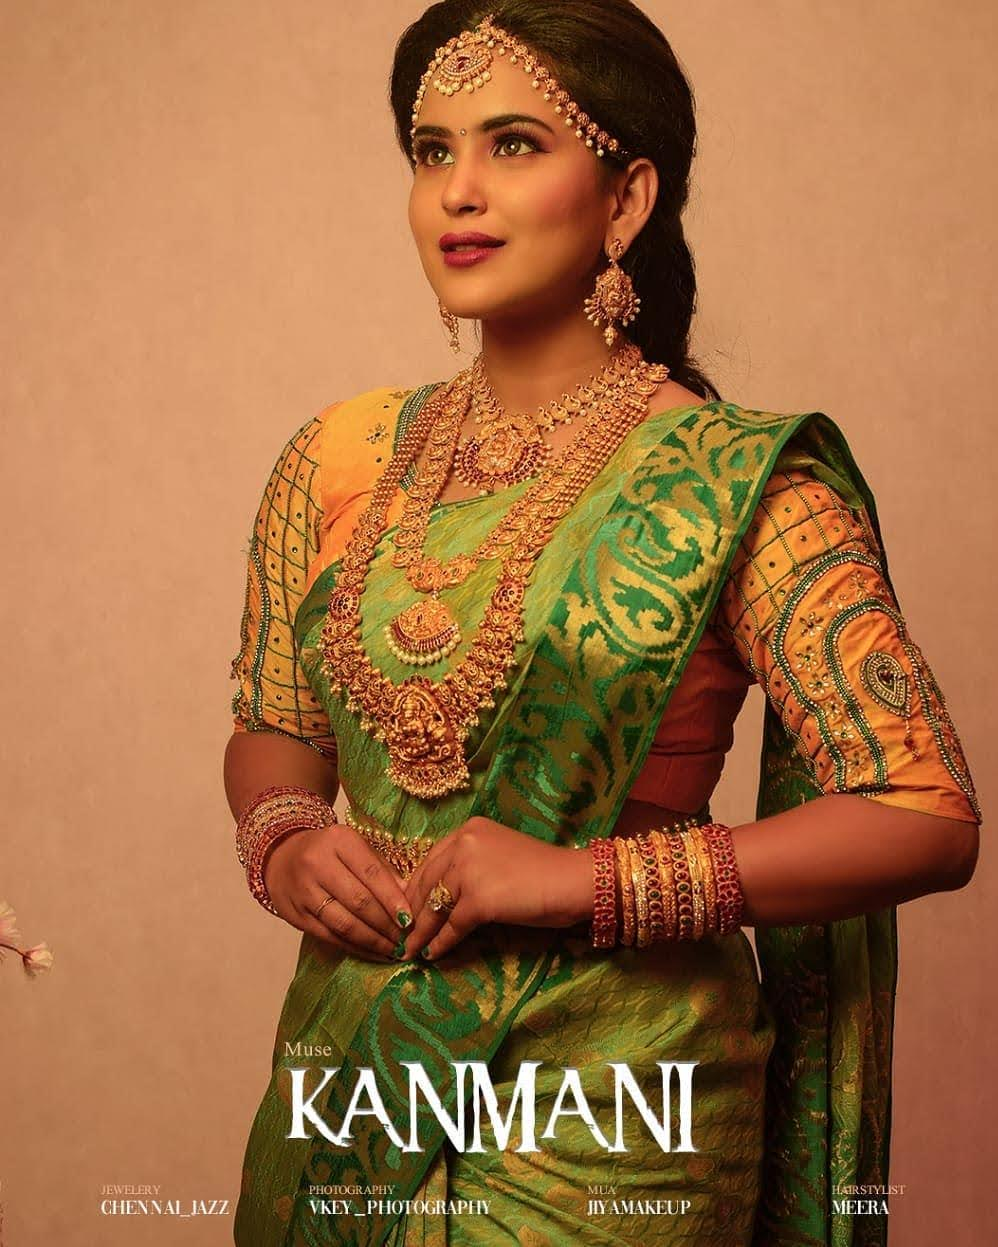 Kanmani-Sweety-Manoharan-Bharathi-Kannamma-18